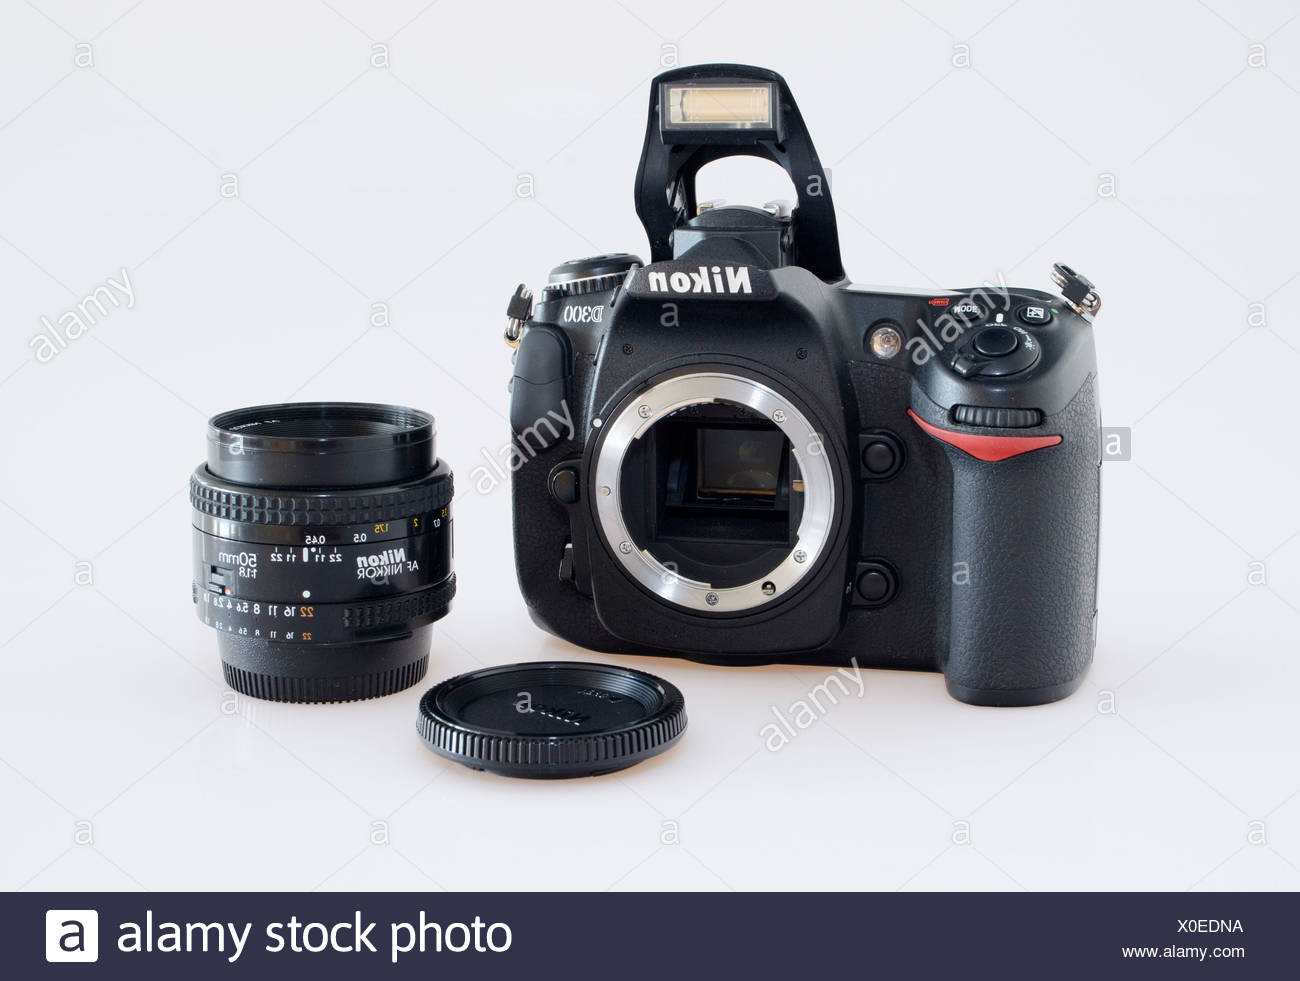 Nikon D300 digital SLR camera with a 50mm lens - Stock Image